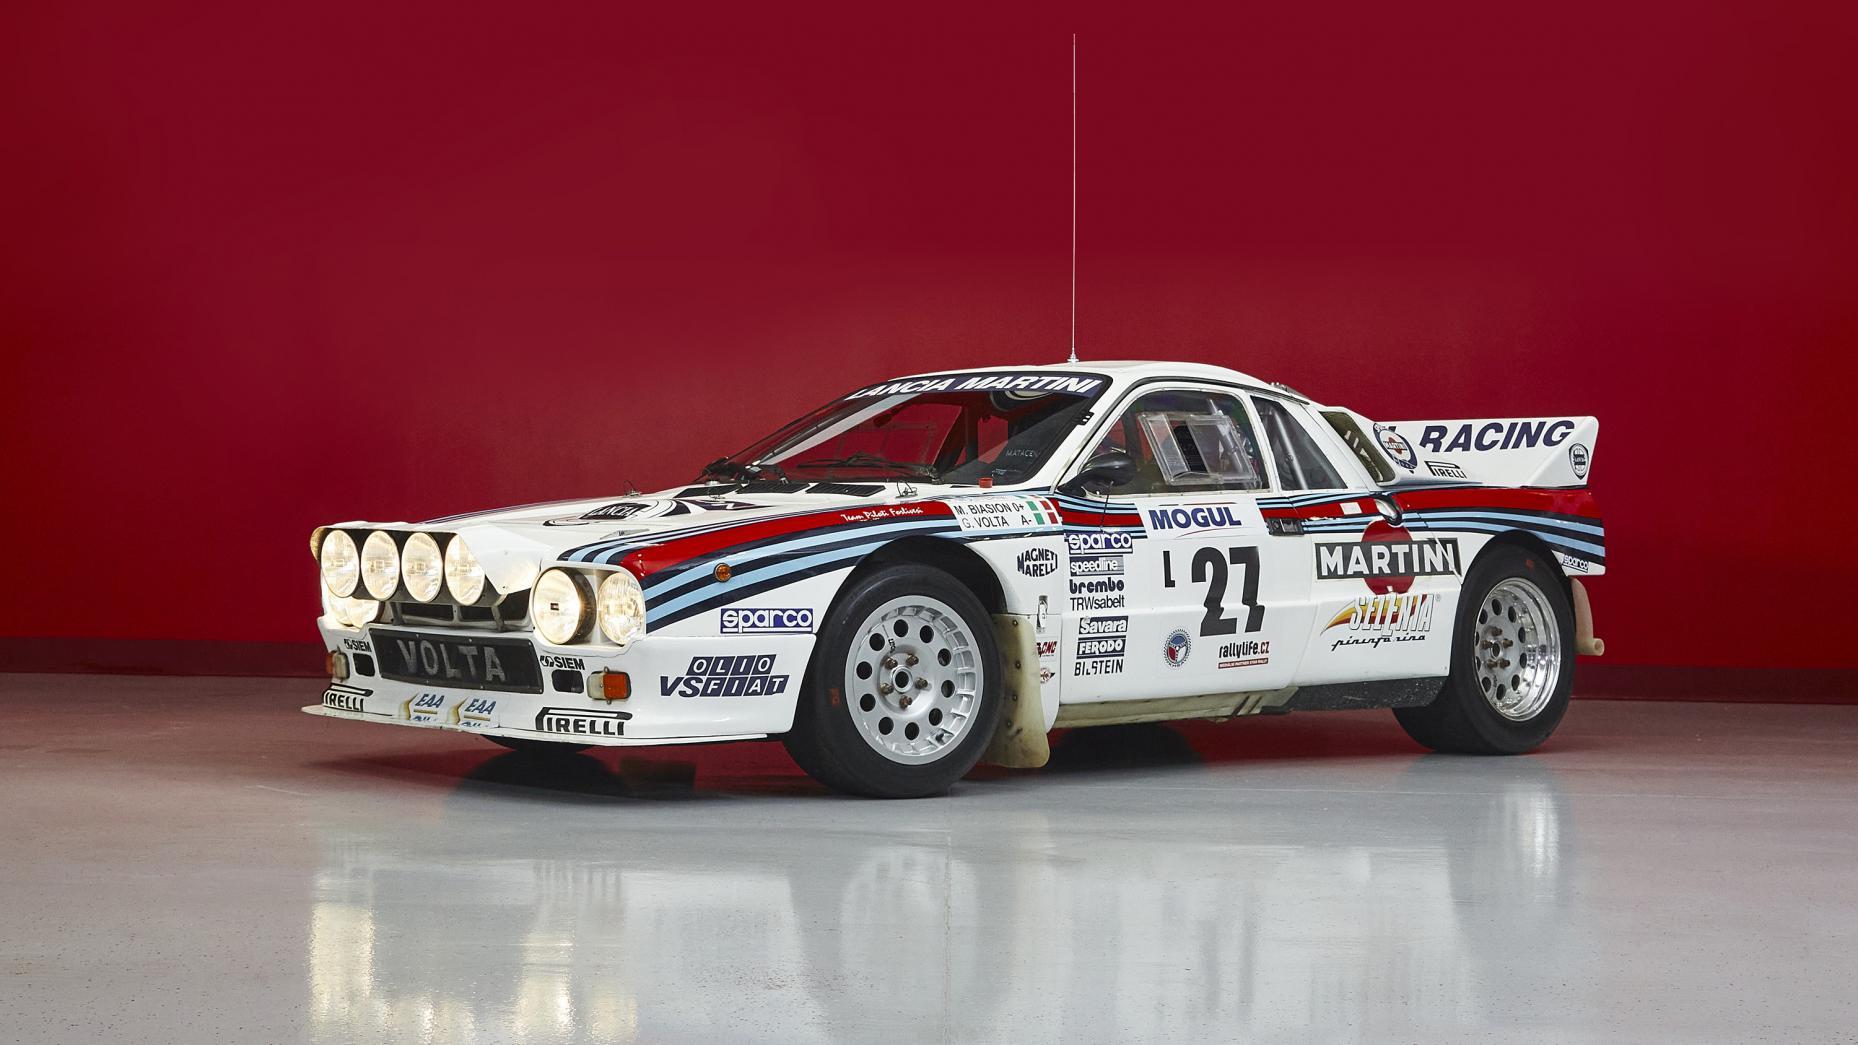 Lancia Delta 037 Rallye Evo 2 Group B